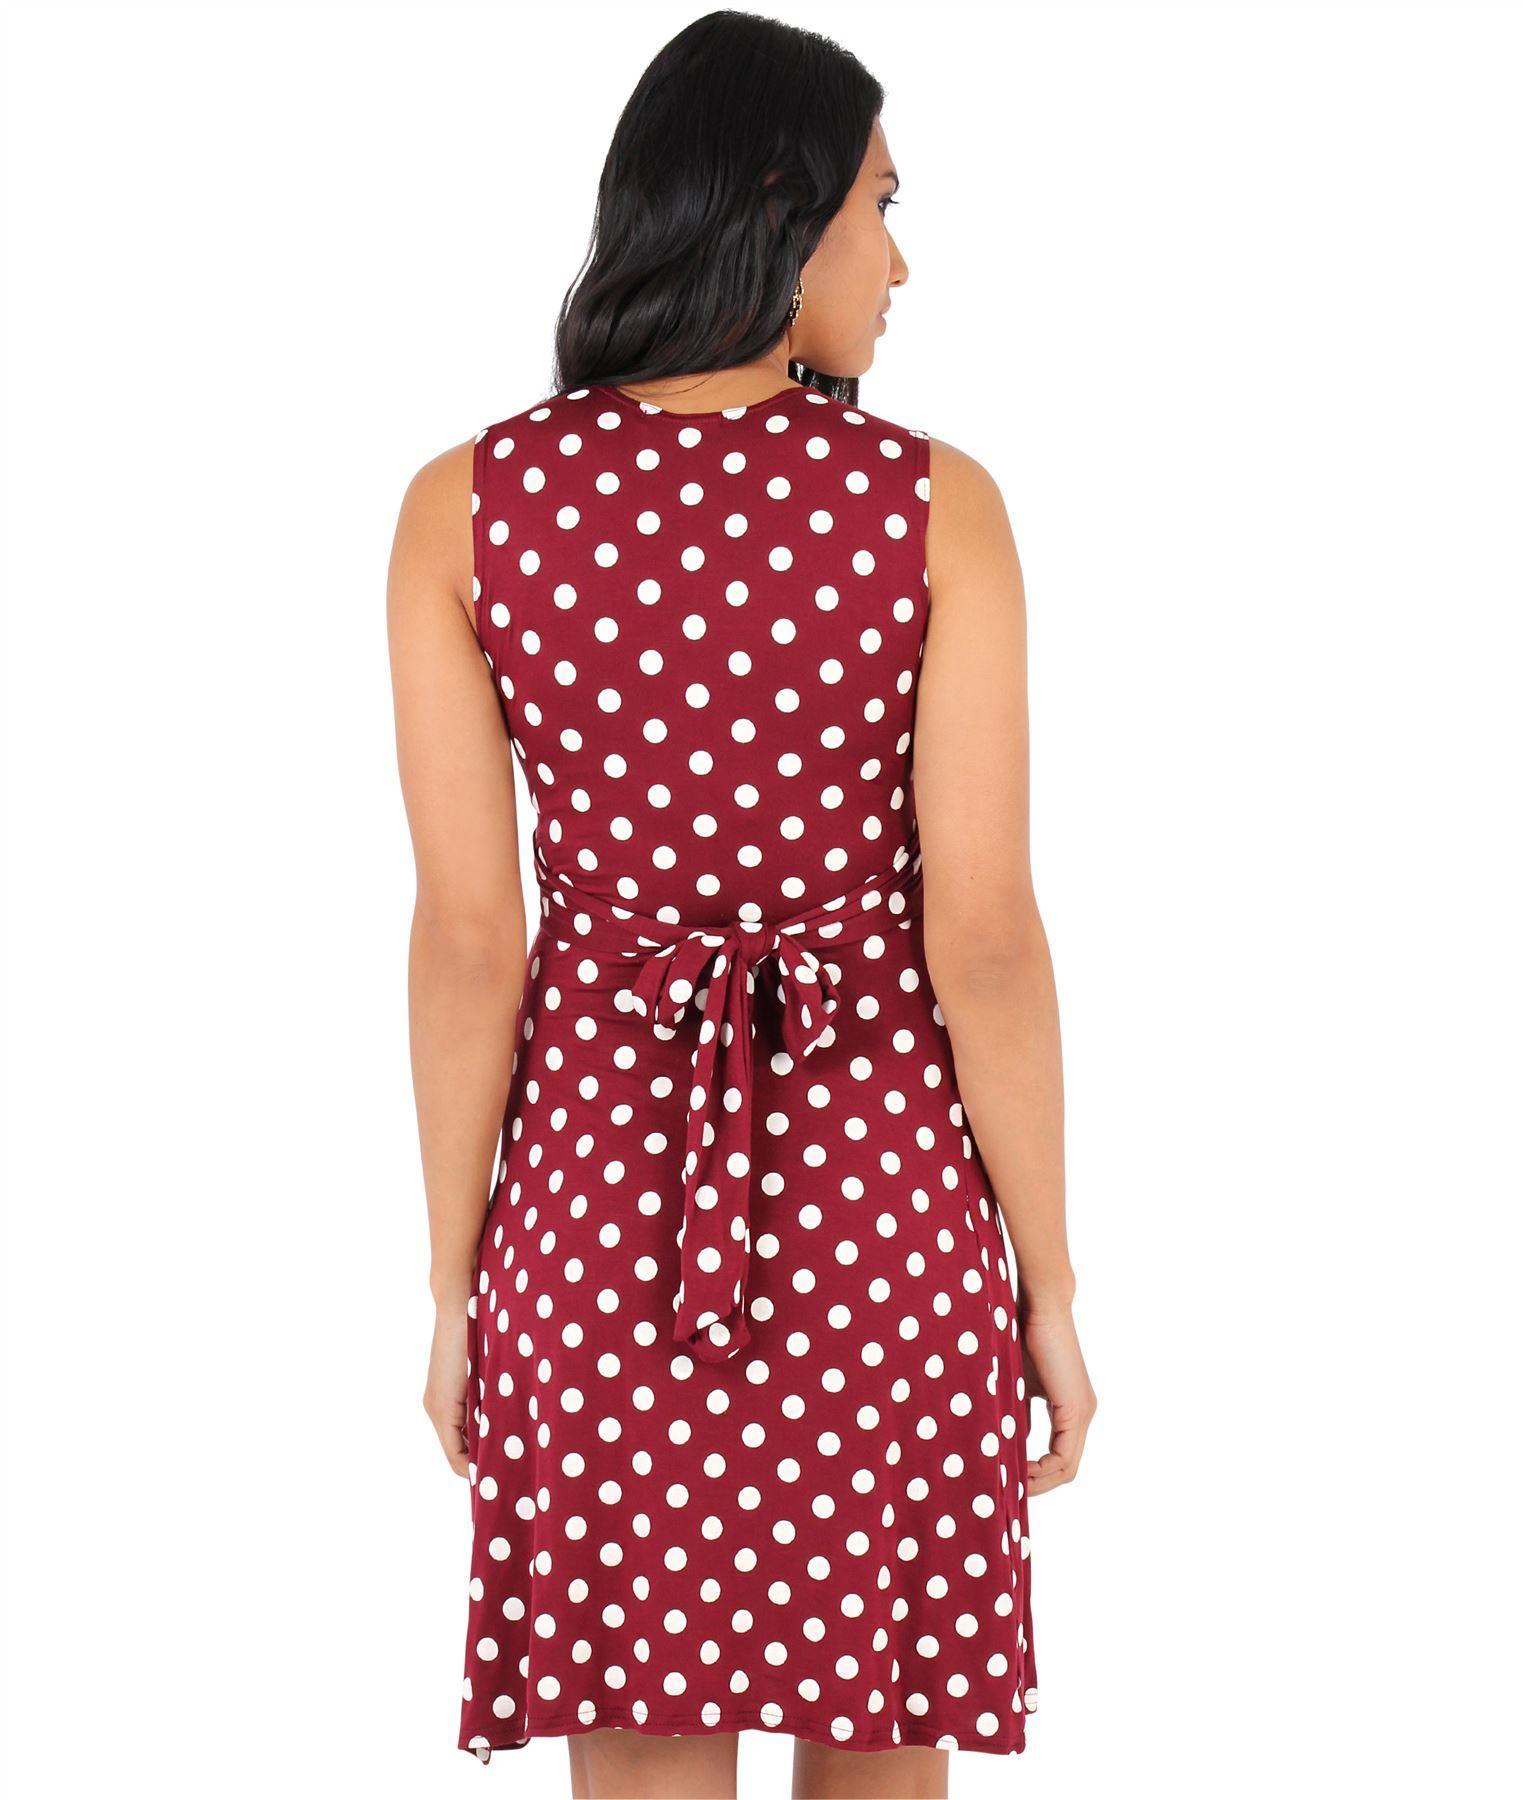 Womens-Polka-Dot-Retro-Dress-Pleated-Skirt-Wrap-Mini-V-Neck-Top-Swing-Party thumbnail 40